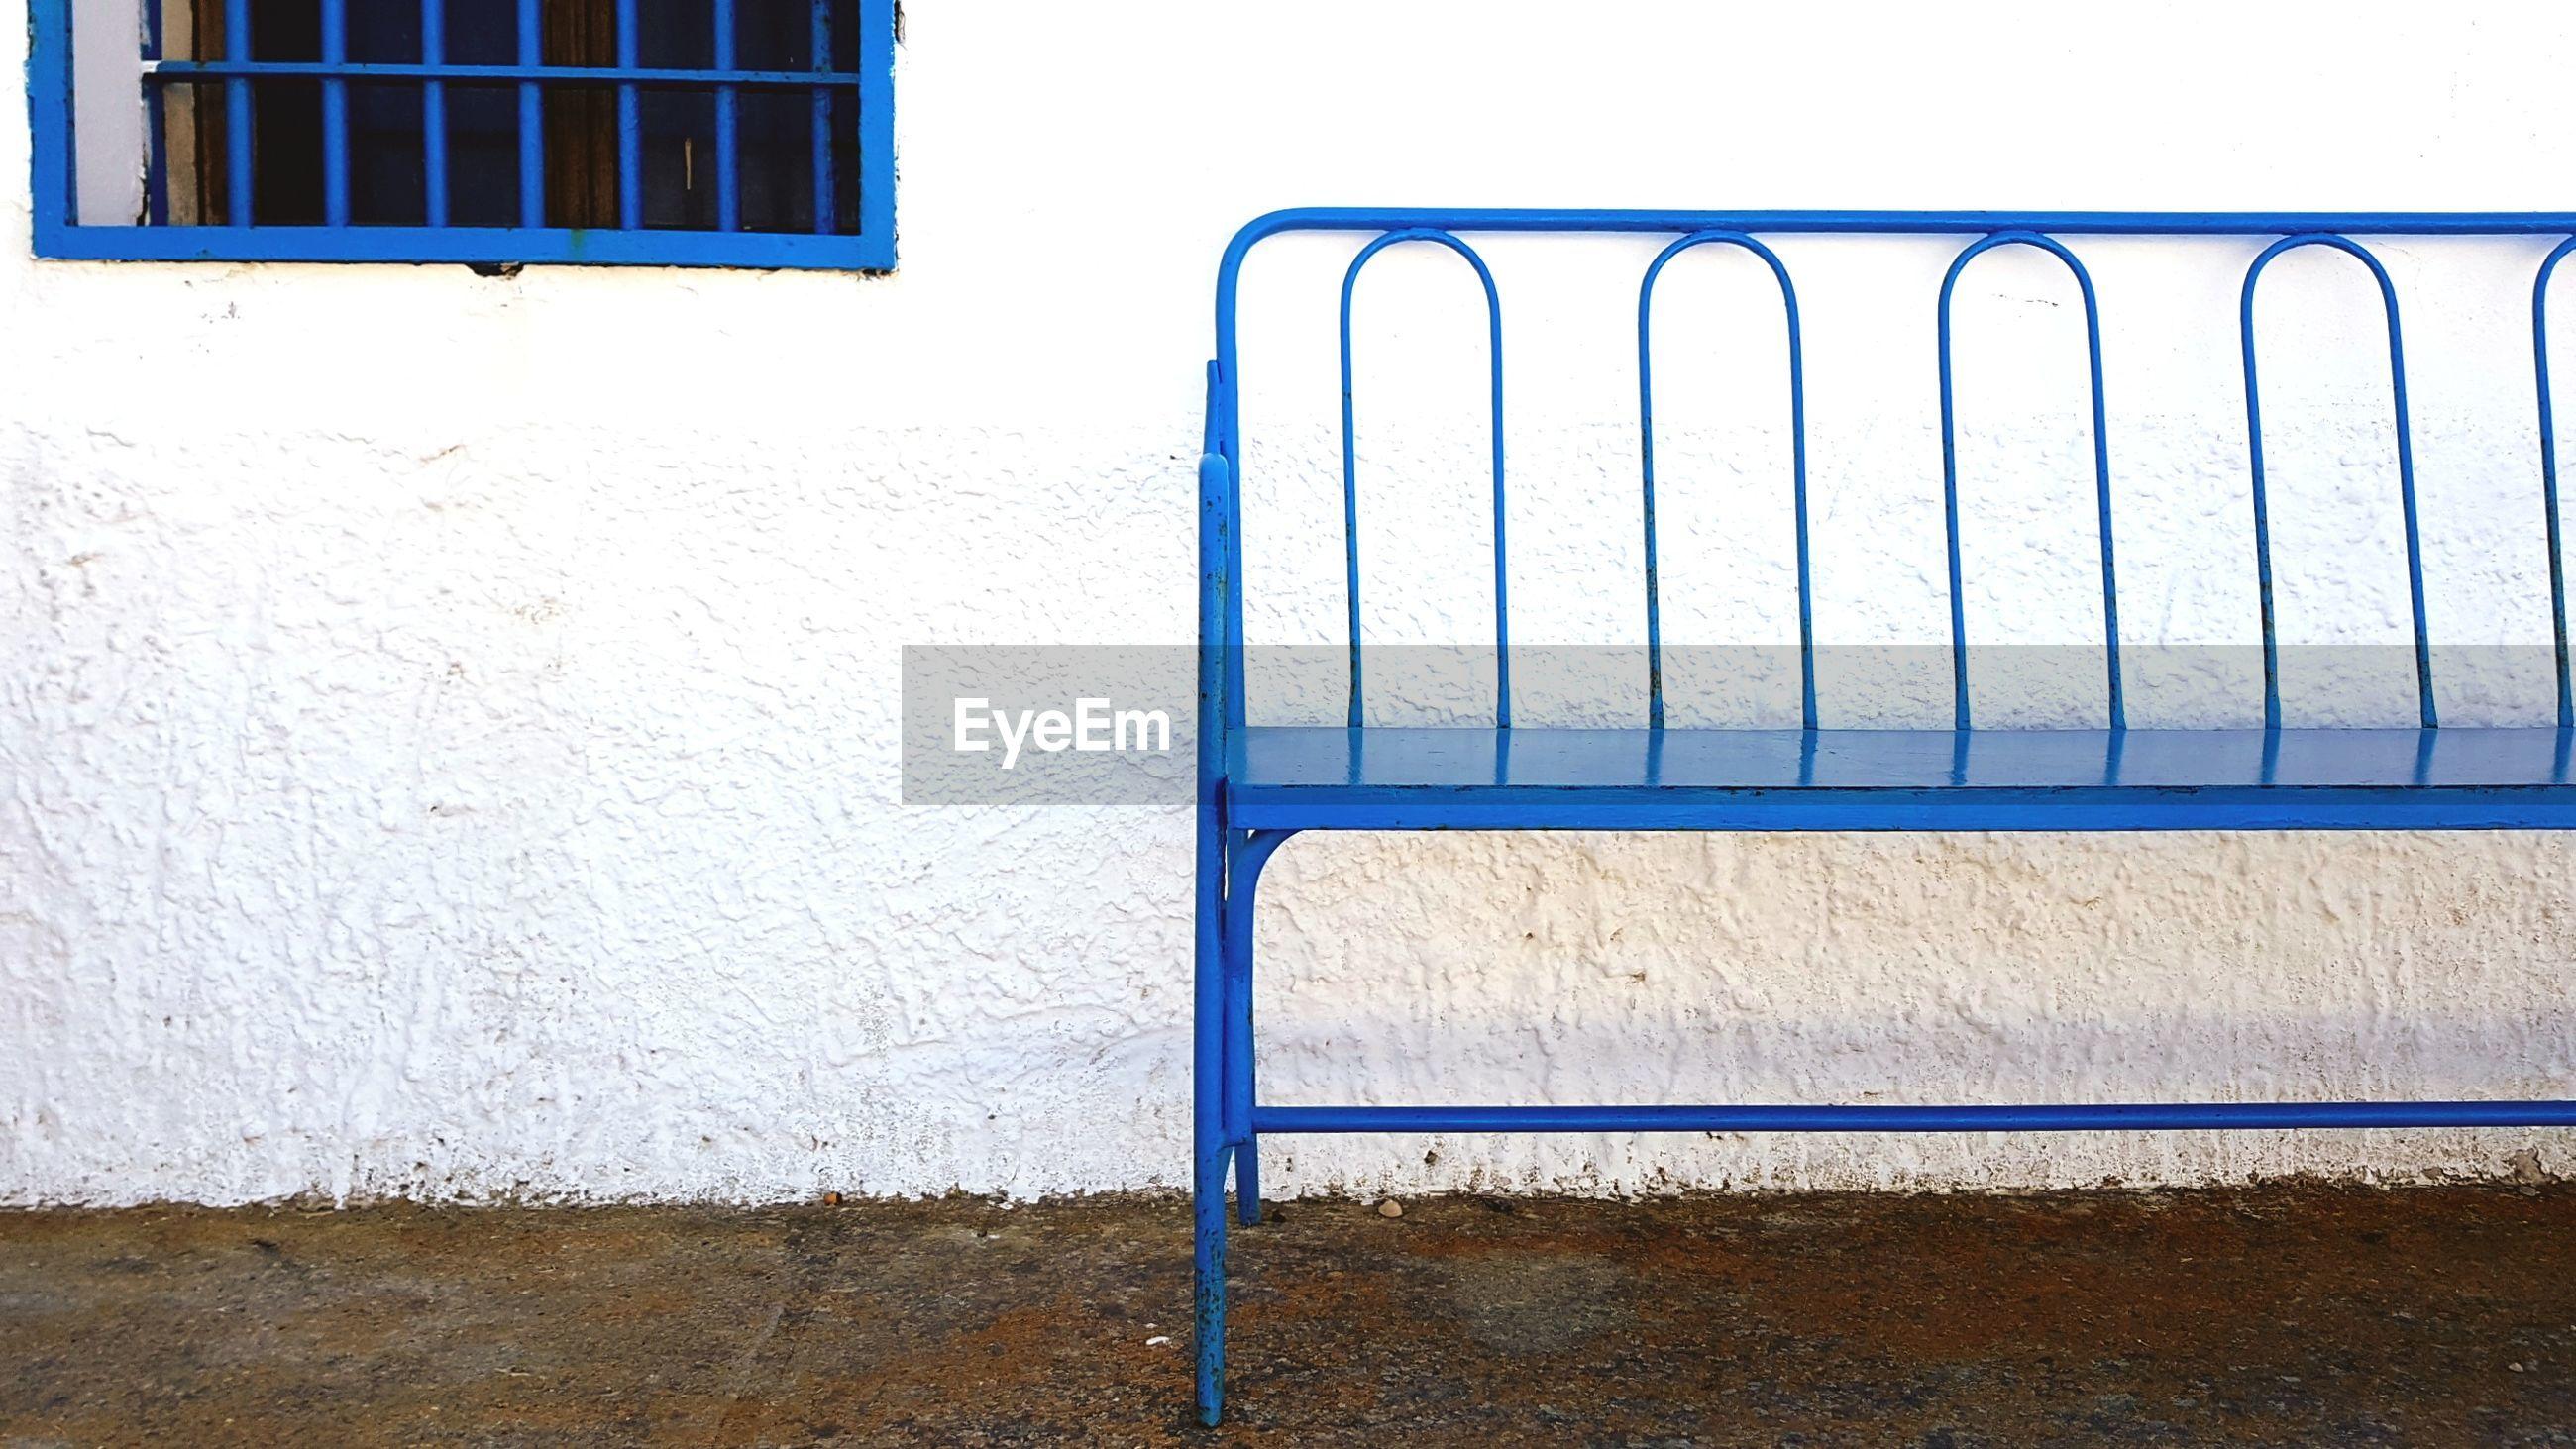 Blue metallic bench against building